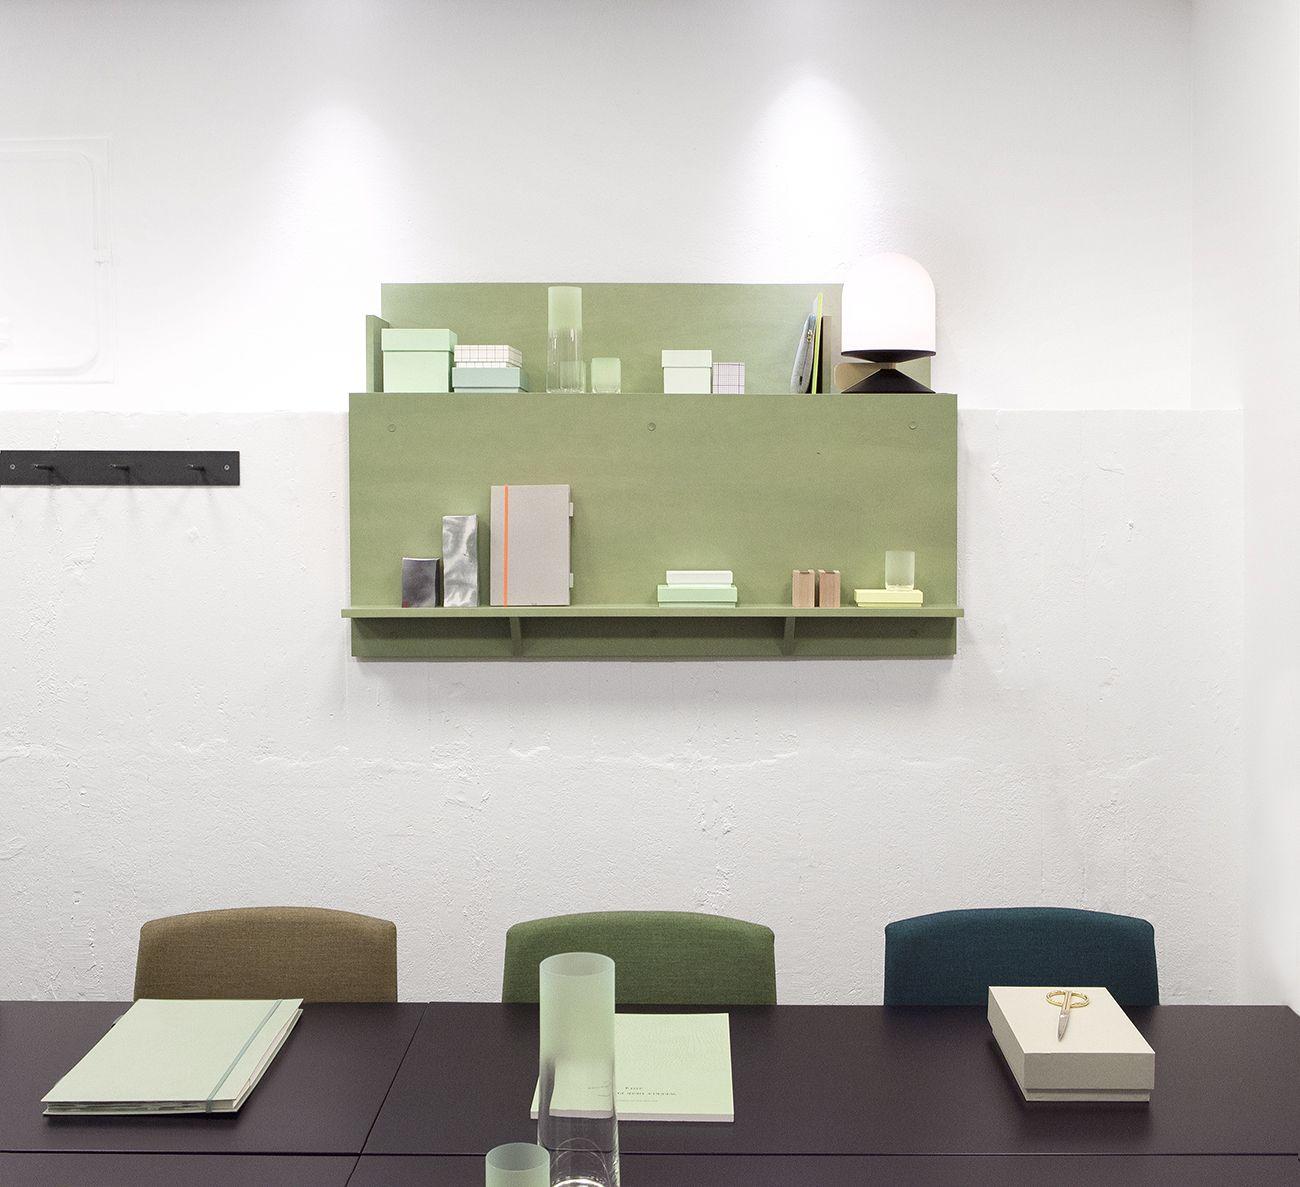 Luma Factory new meeting areas. Design concept by Note design studio.